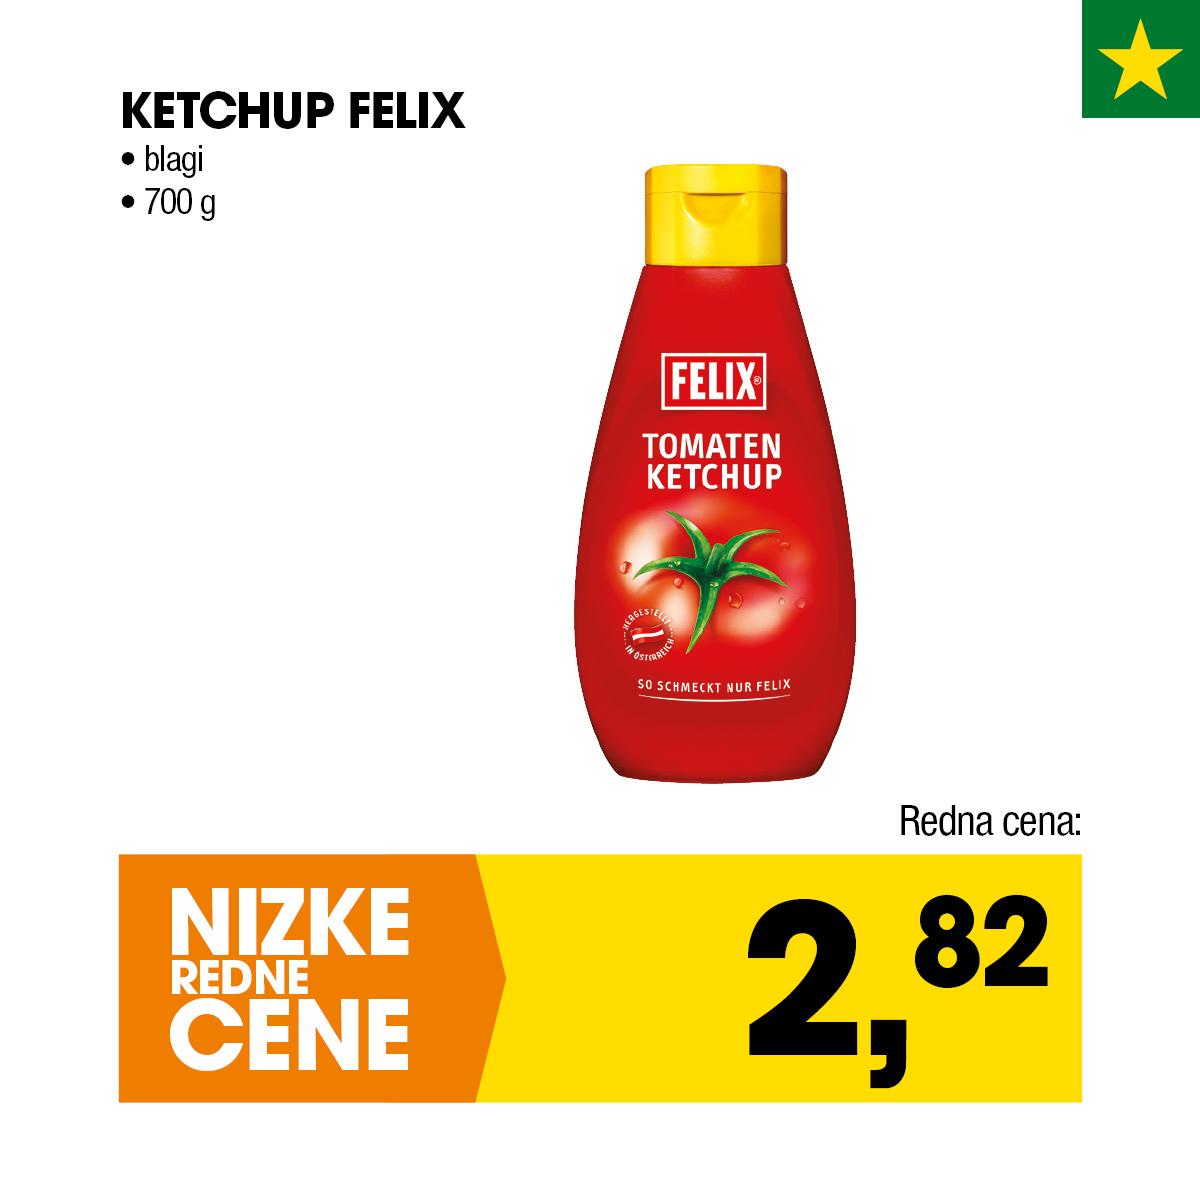 Nizke cene - Ketchup Felix